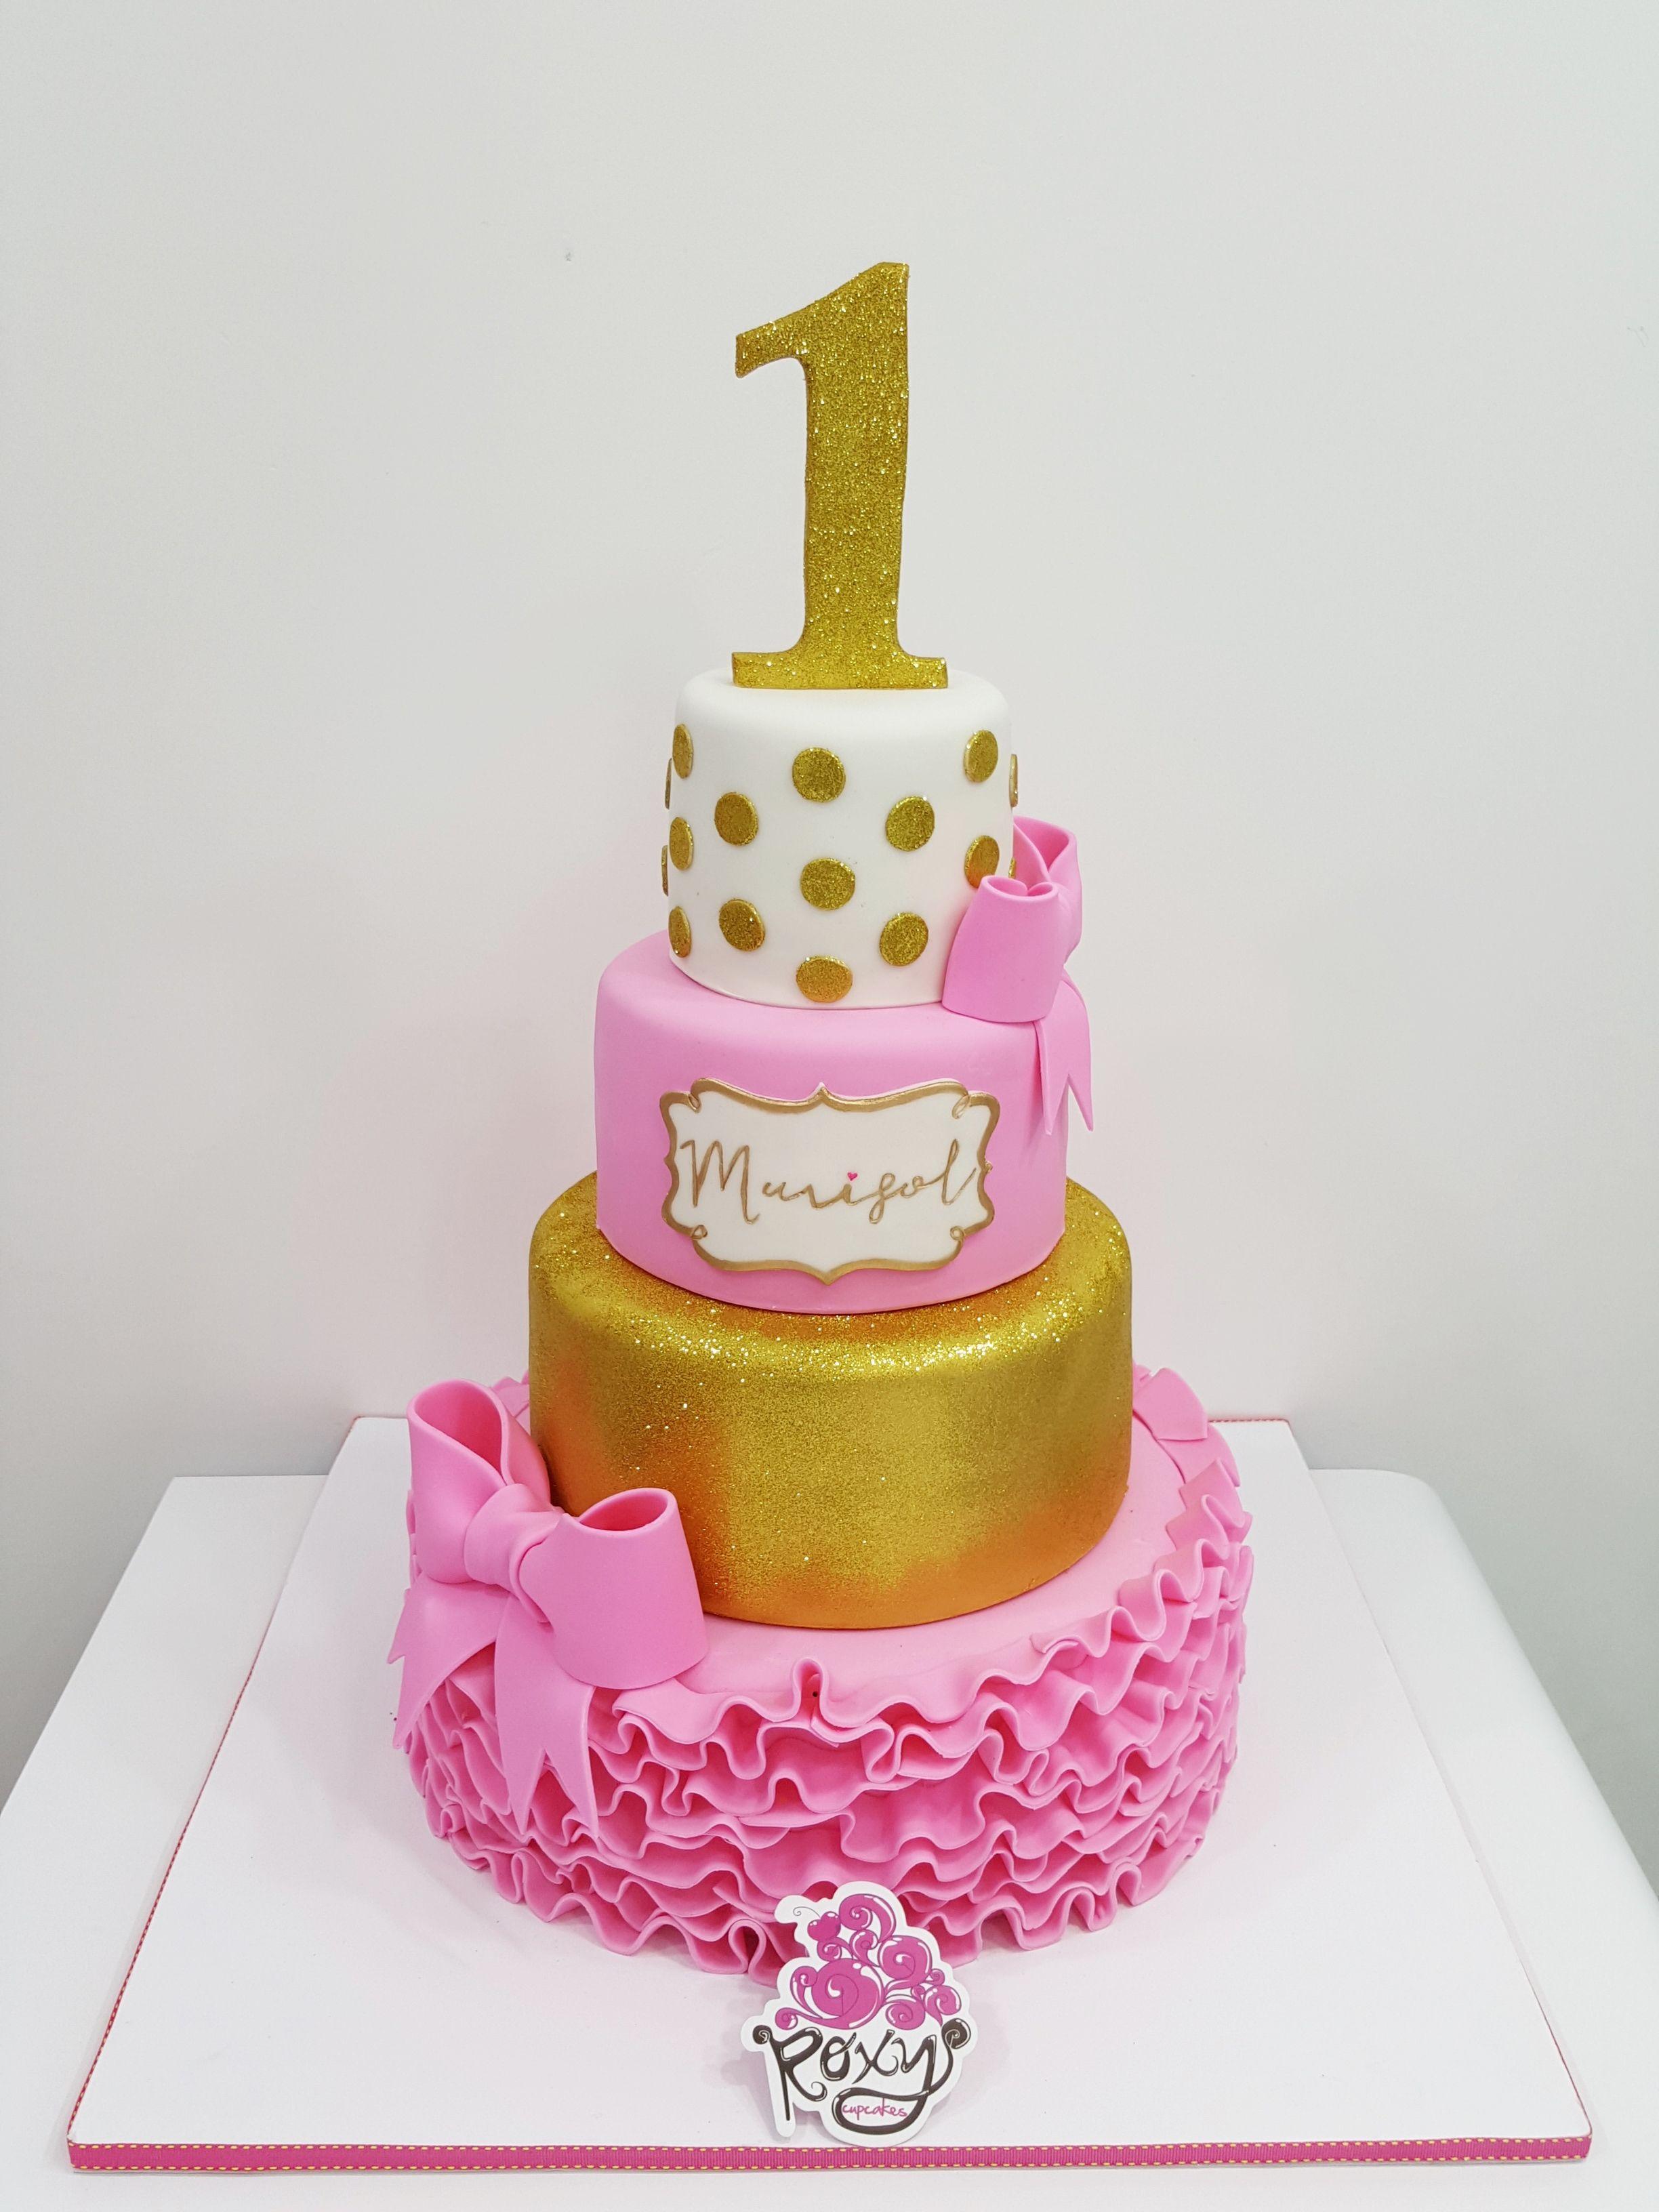 Pink and gold polka dot and ruffle birthday